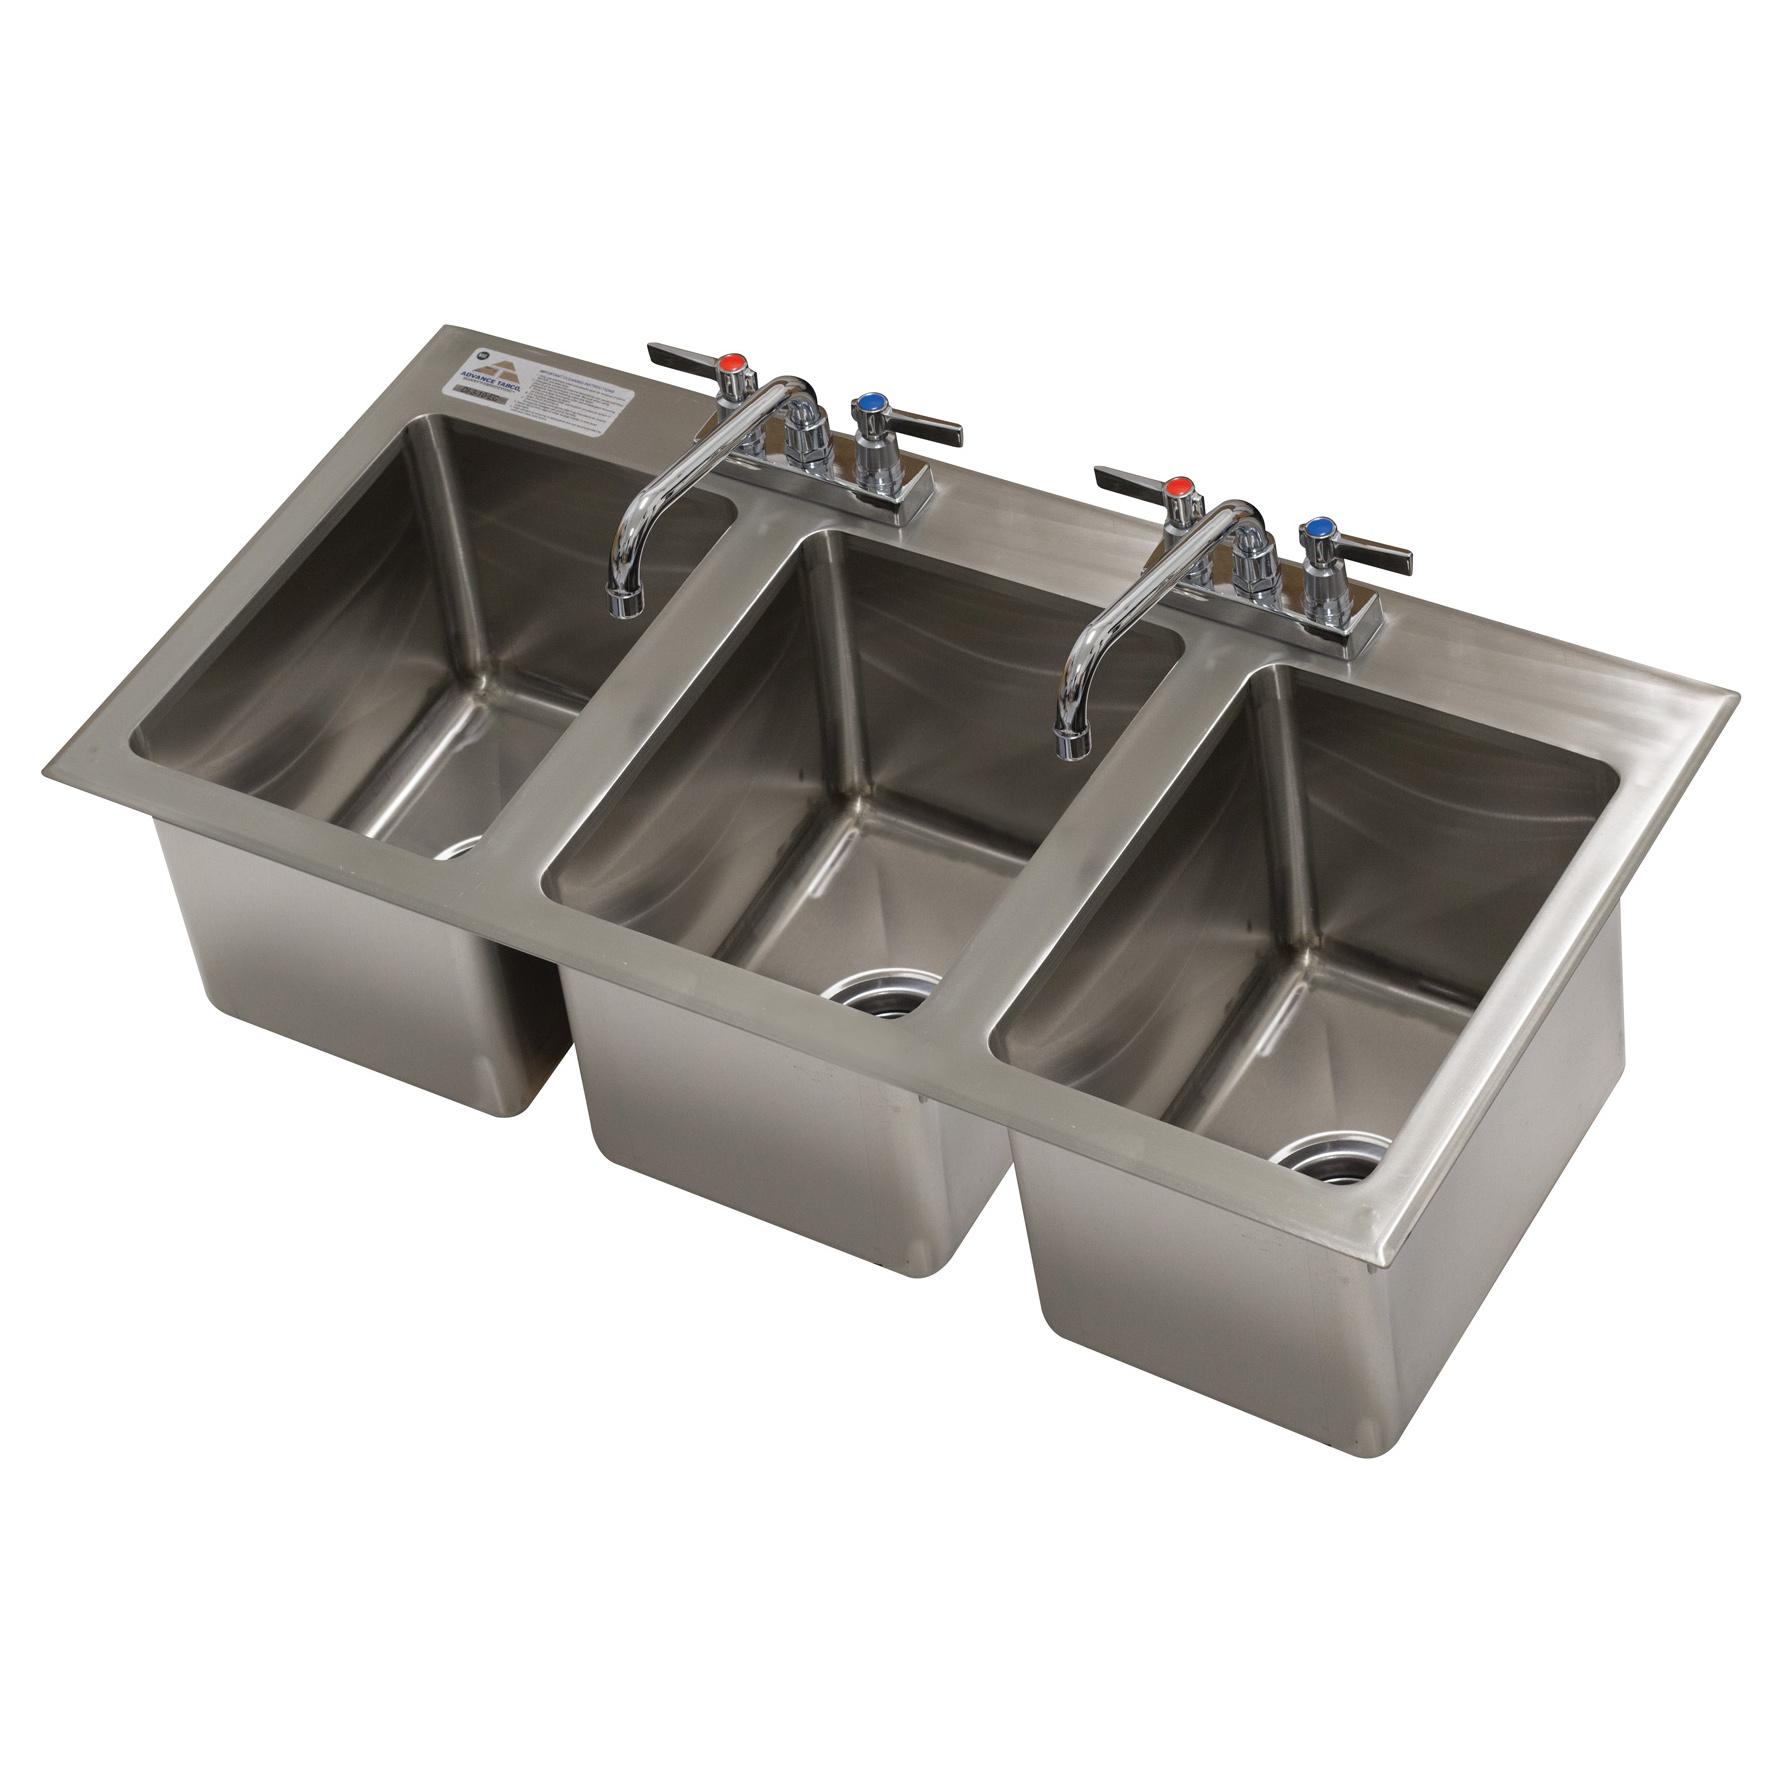 Advance Tabco DI-3-10-EC-X sink, drop-in